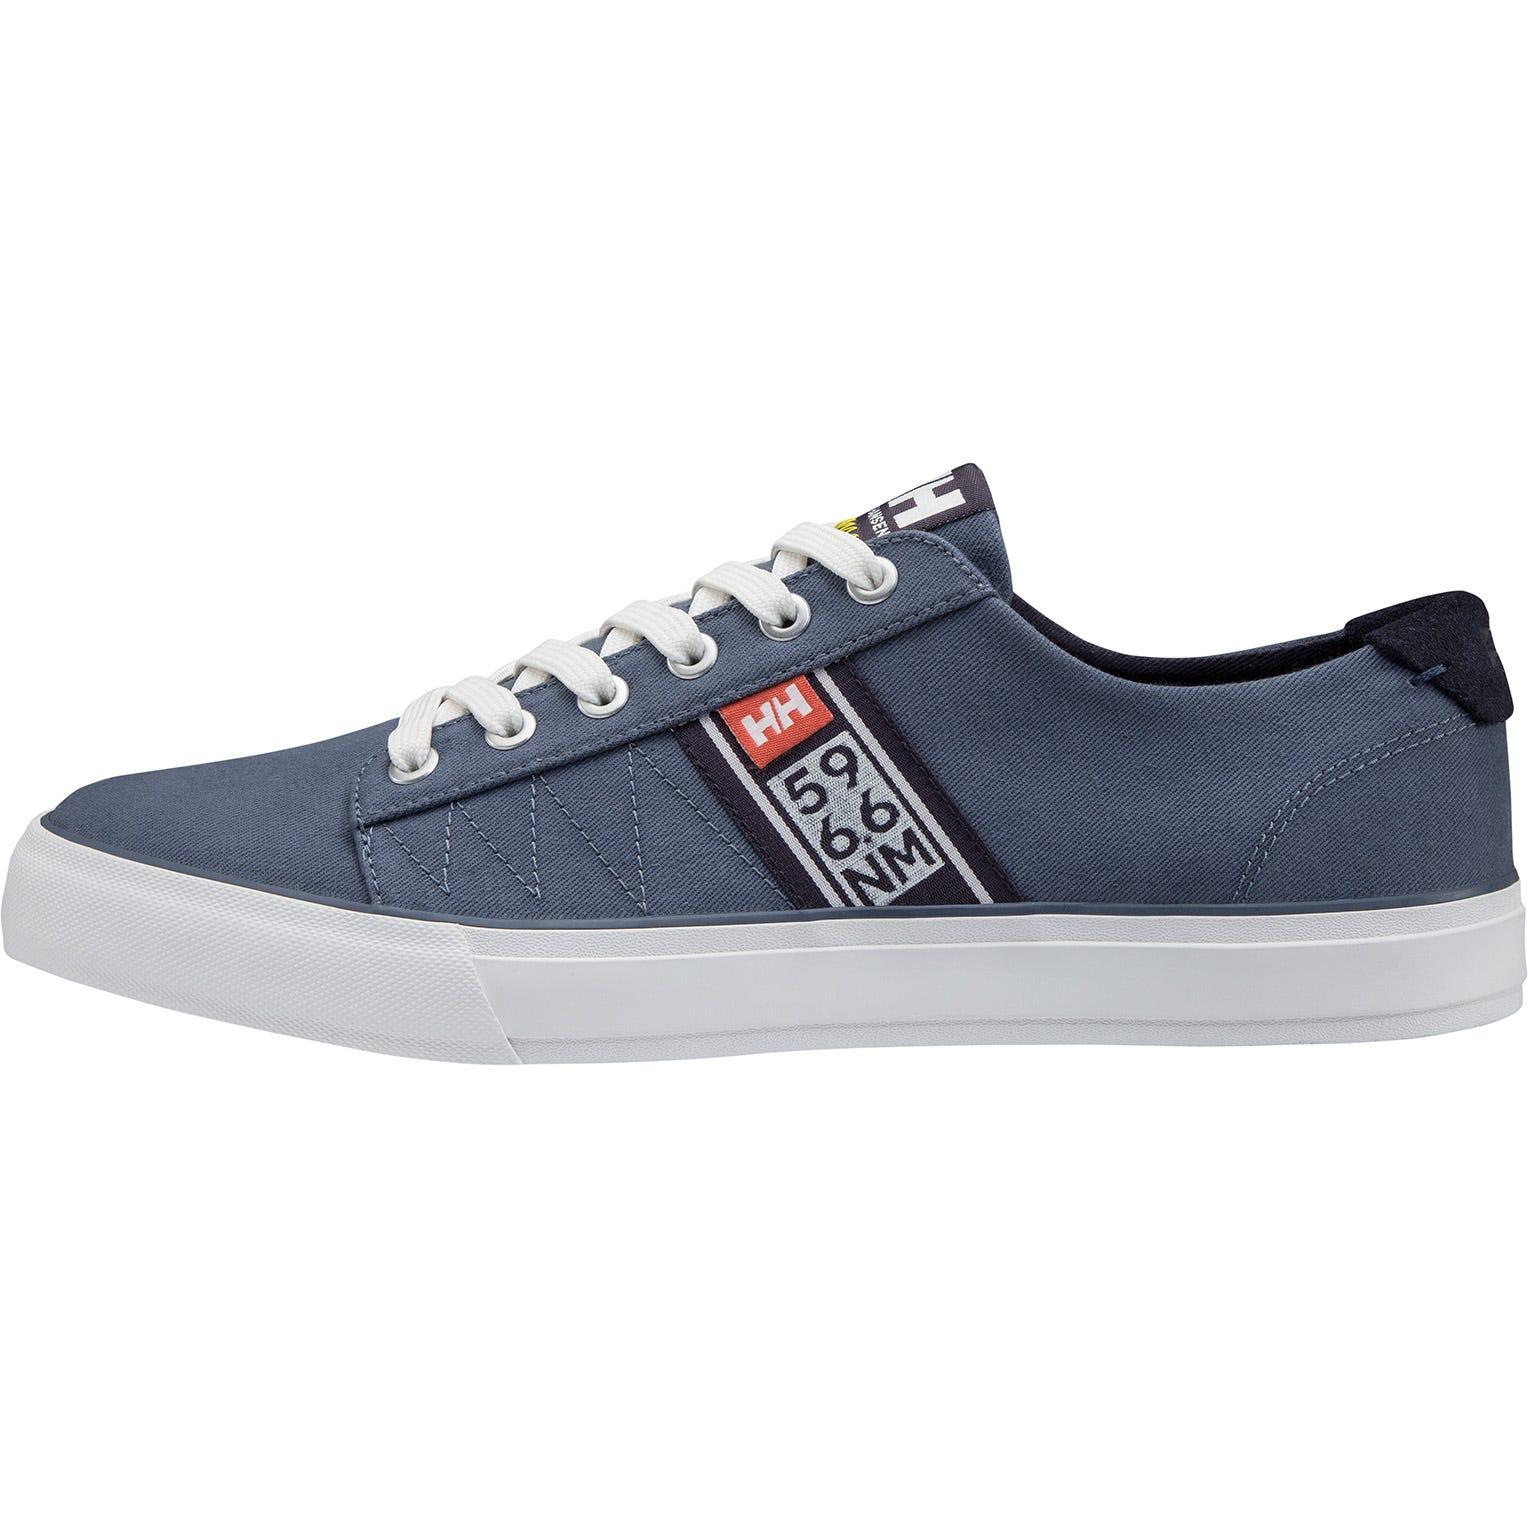 Helly Hansen Salt Flag F1 Mens :casual Shoe Blue 42/8.5